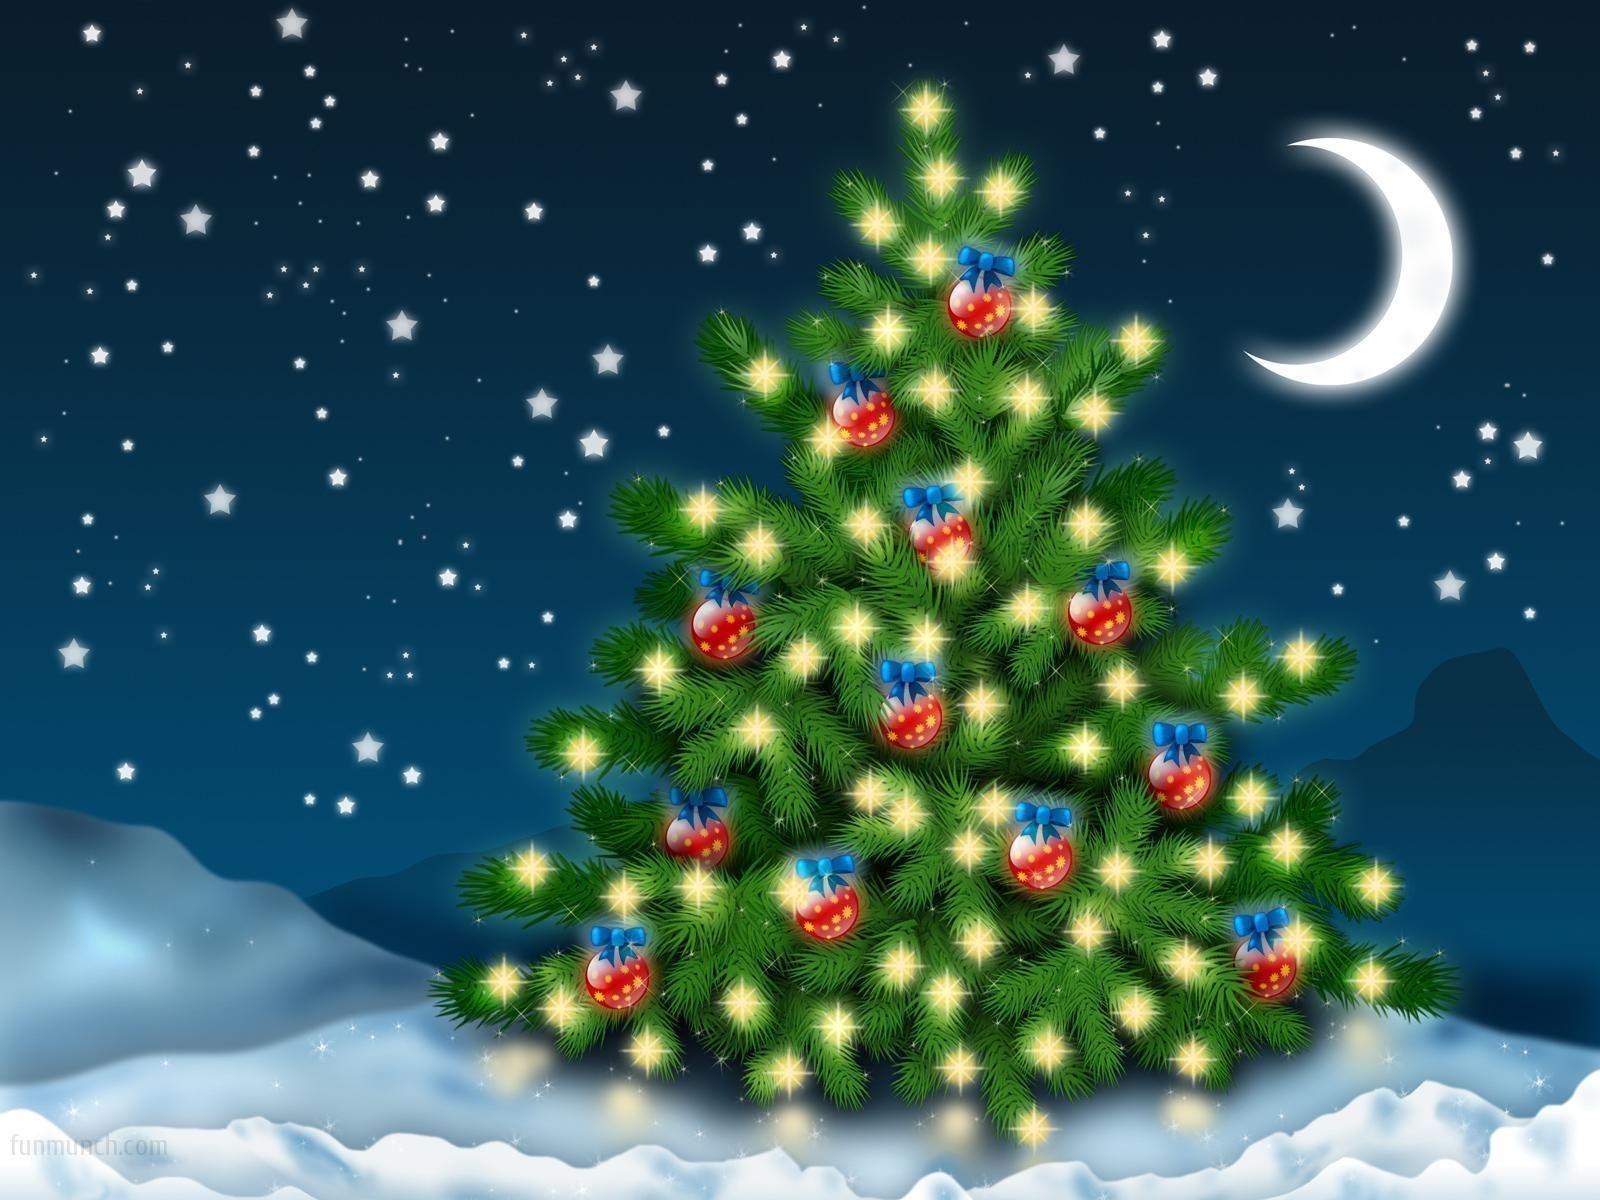 christmas lights pictures - Google Search | christmas lights ...